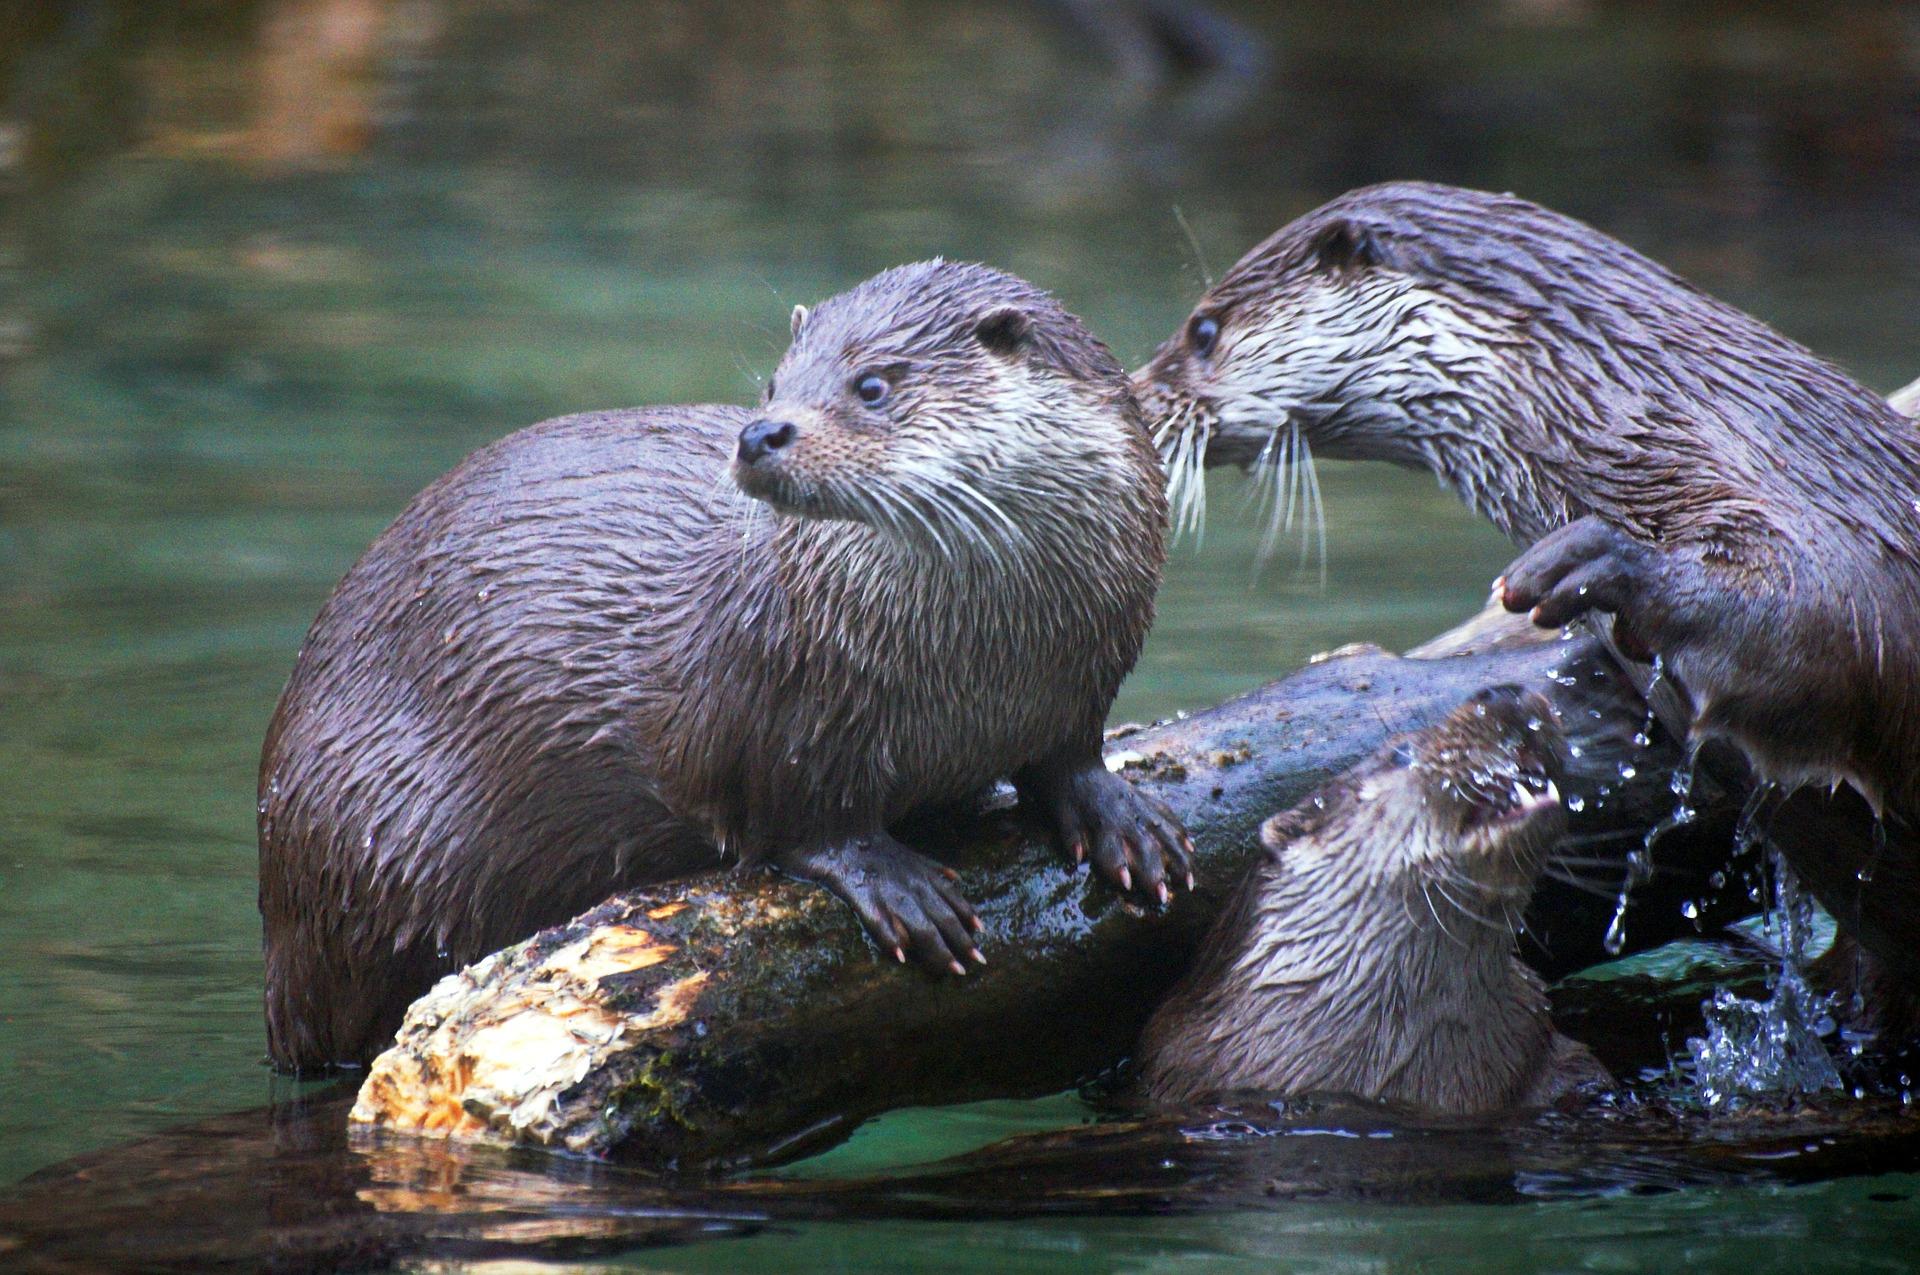 pixabay.com_.de-photosfischotter-otter-tiere-natur-50357